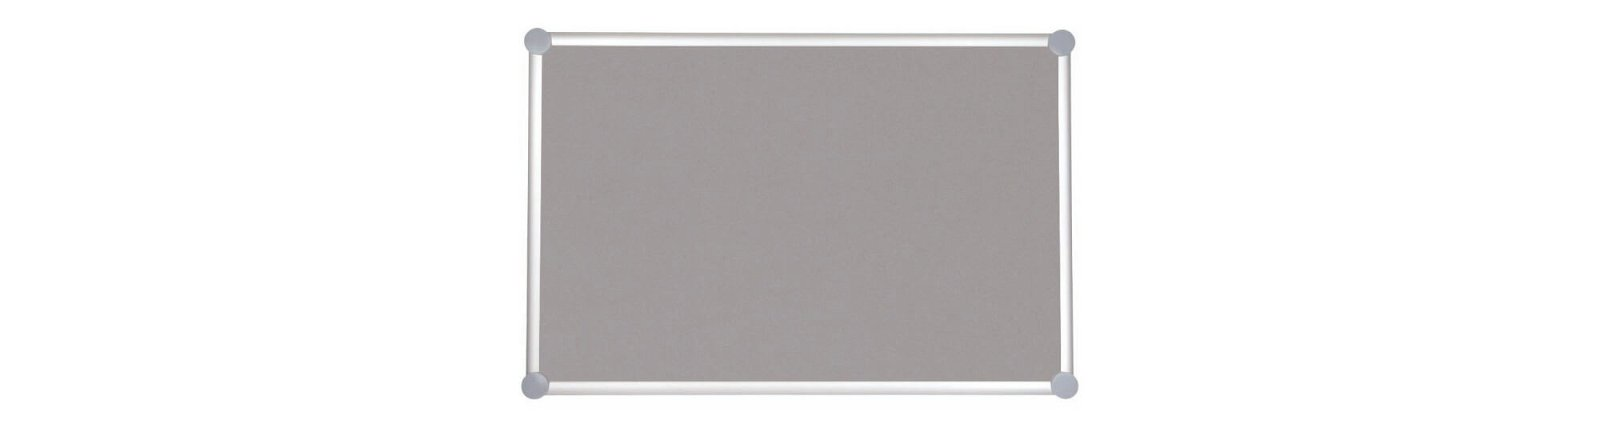 Pinnboard 2000 MAULpro, Textil, 90x120 cm, grau